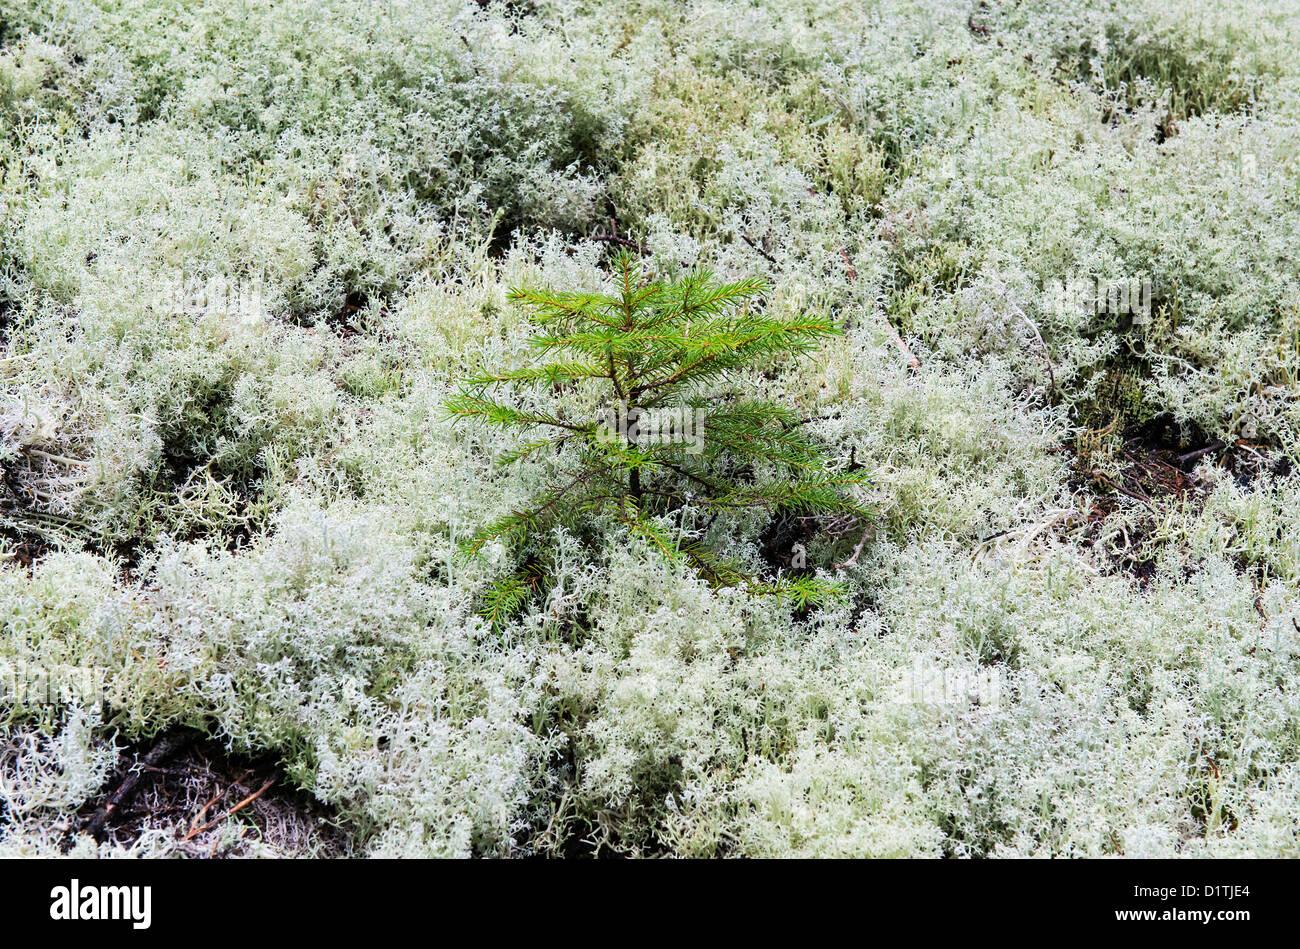 Evergreen spruce seedling, Mt desert Island, Maine - Stock Image